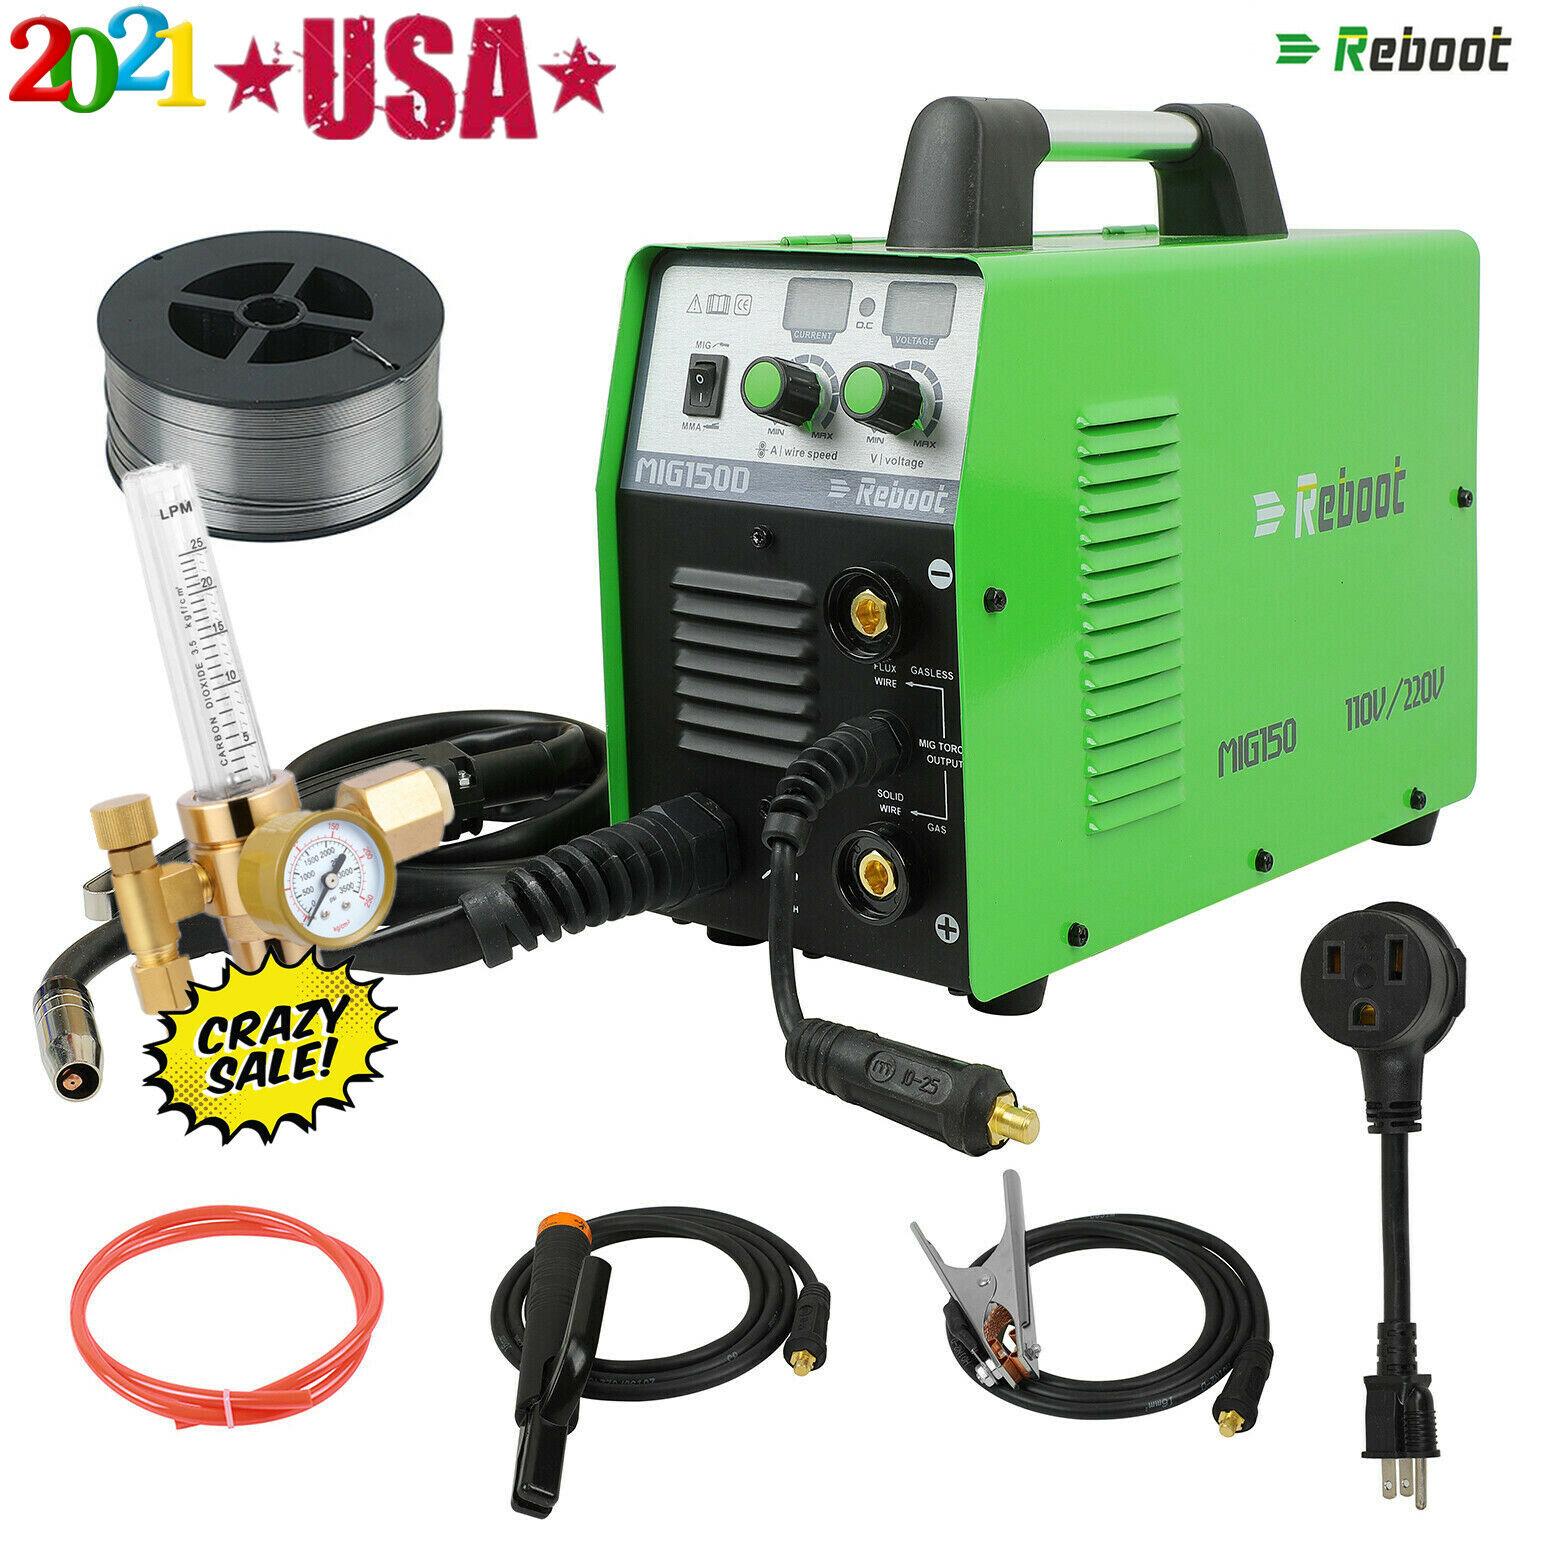 MIG Welder 150A Gas Gasless 110V 220V IGBT STICK ARC Machine + CO2 GAS Regulator. Buy it now for 288.99